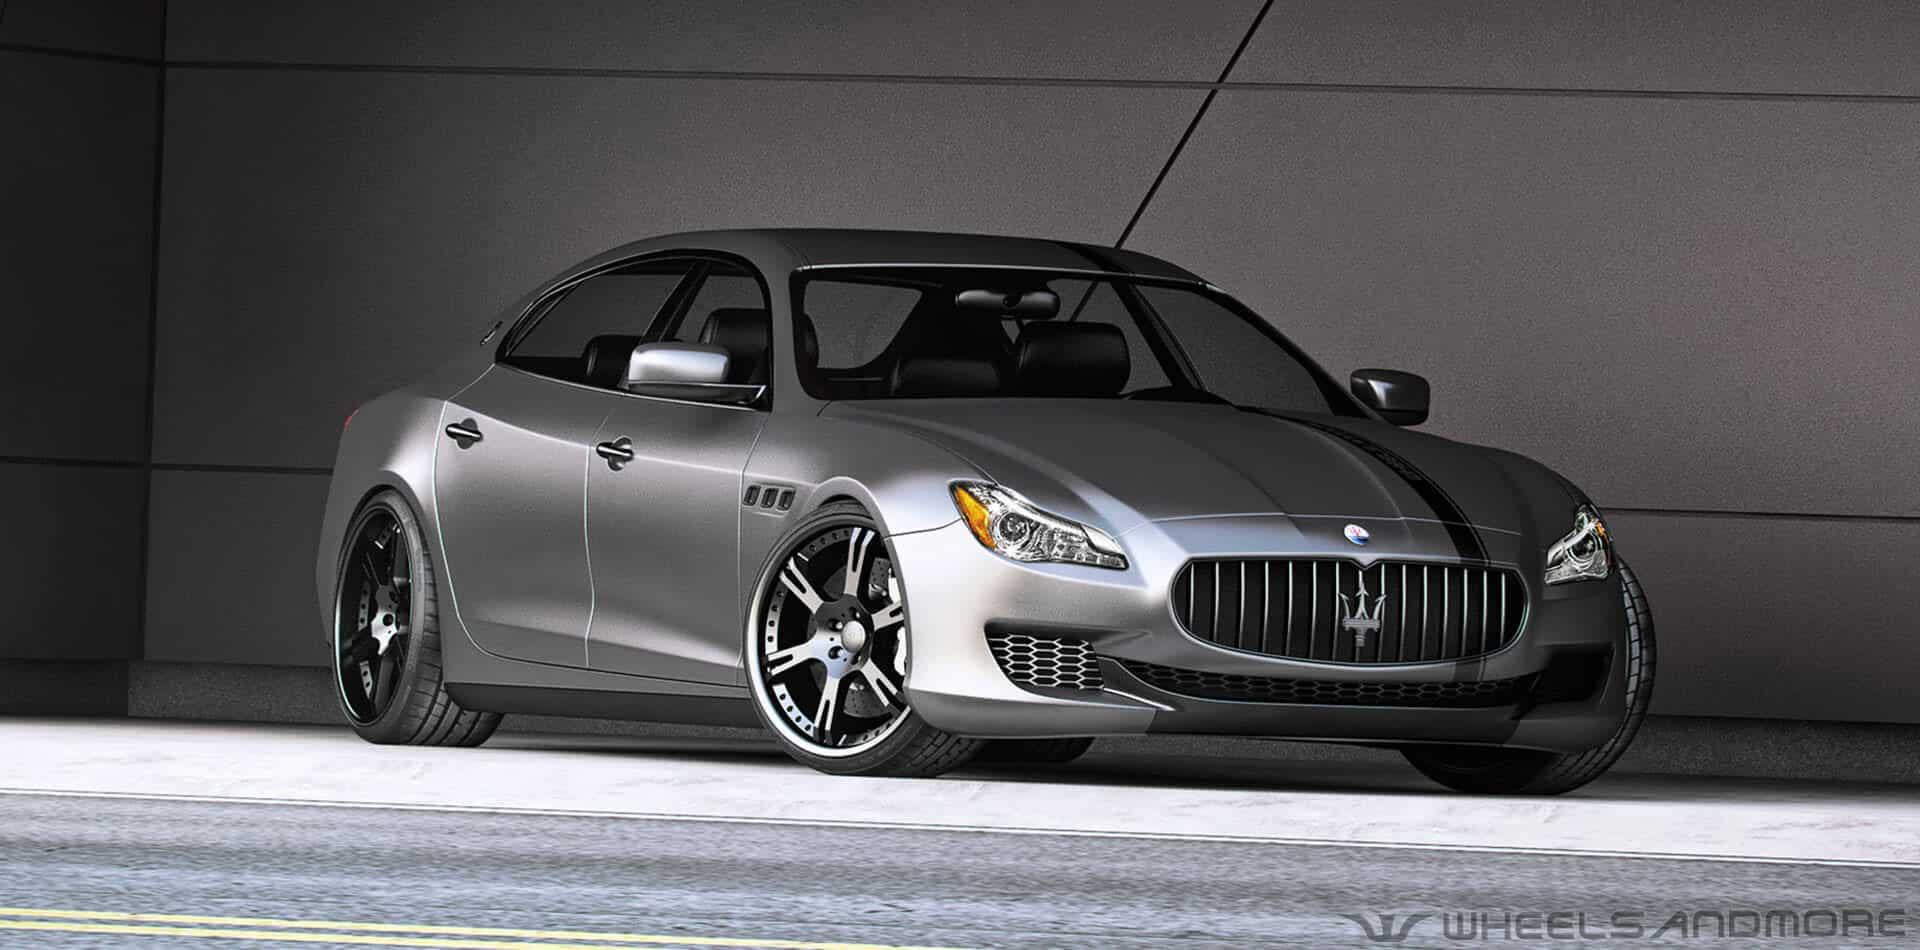 Maserati Ghibli Price >> Maserati Ghibli / Quattroporte Tuning | Wheelsandmore › Wheelsandmore Tuning